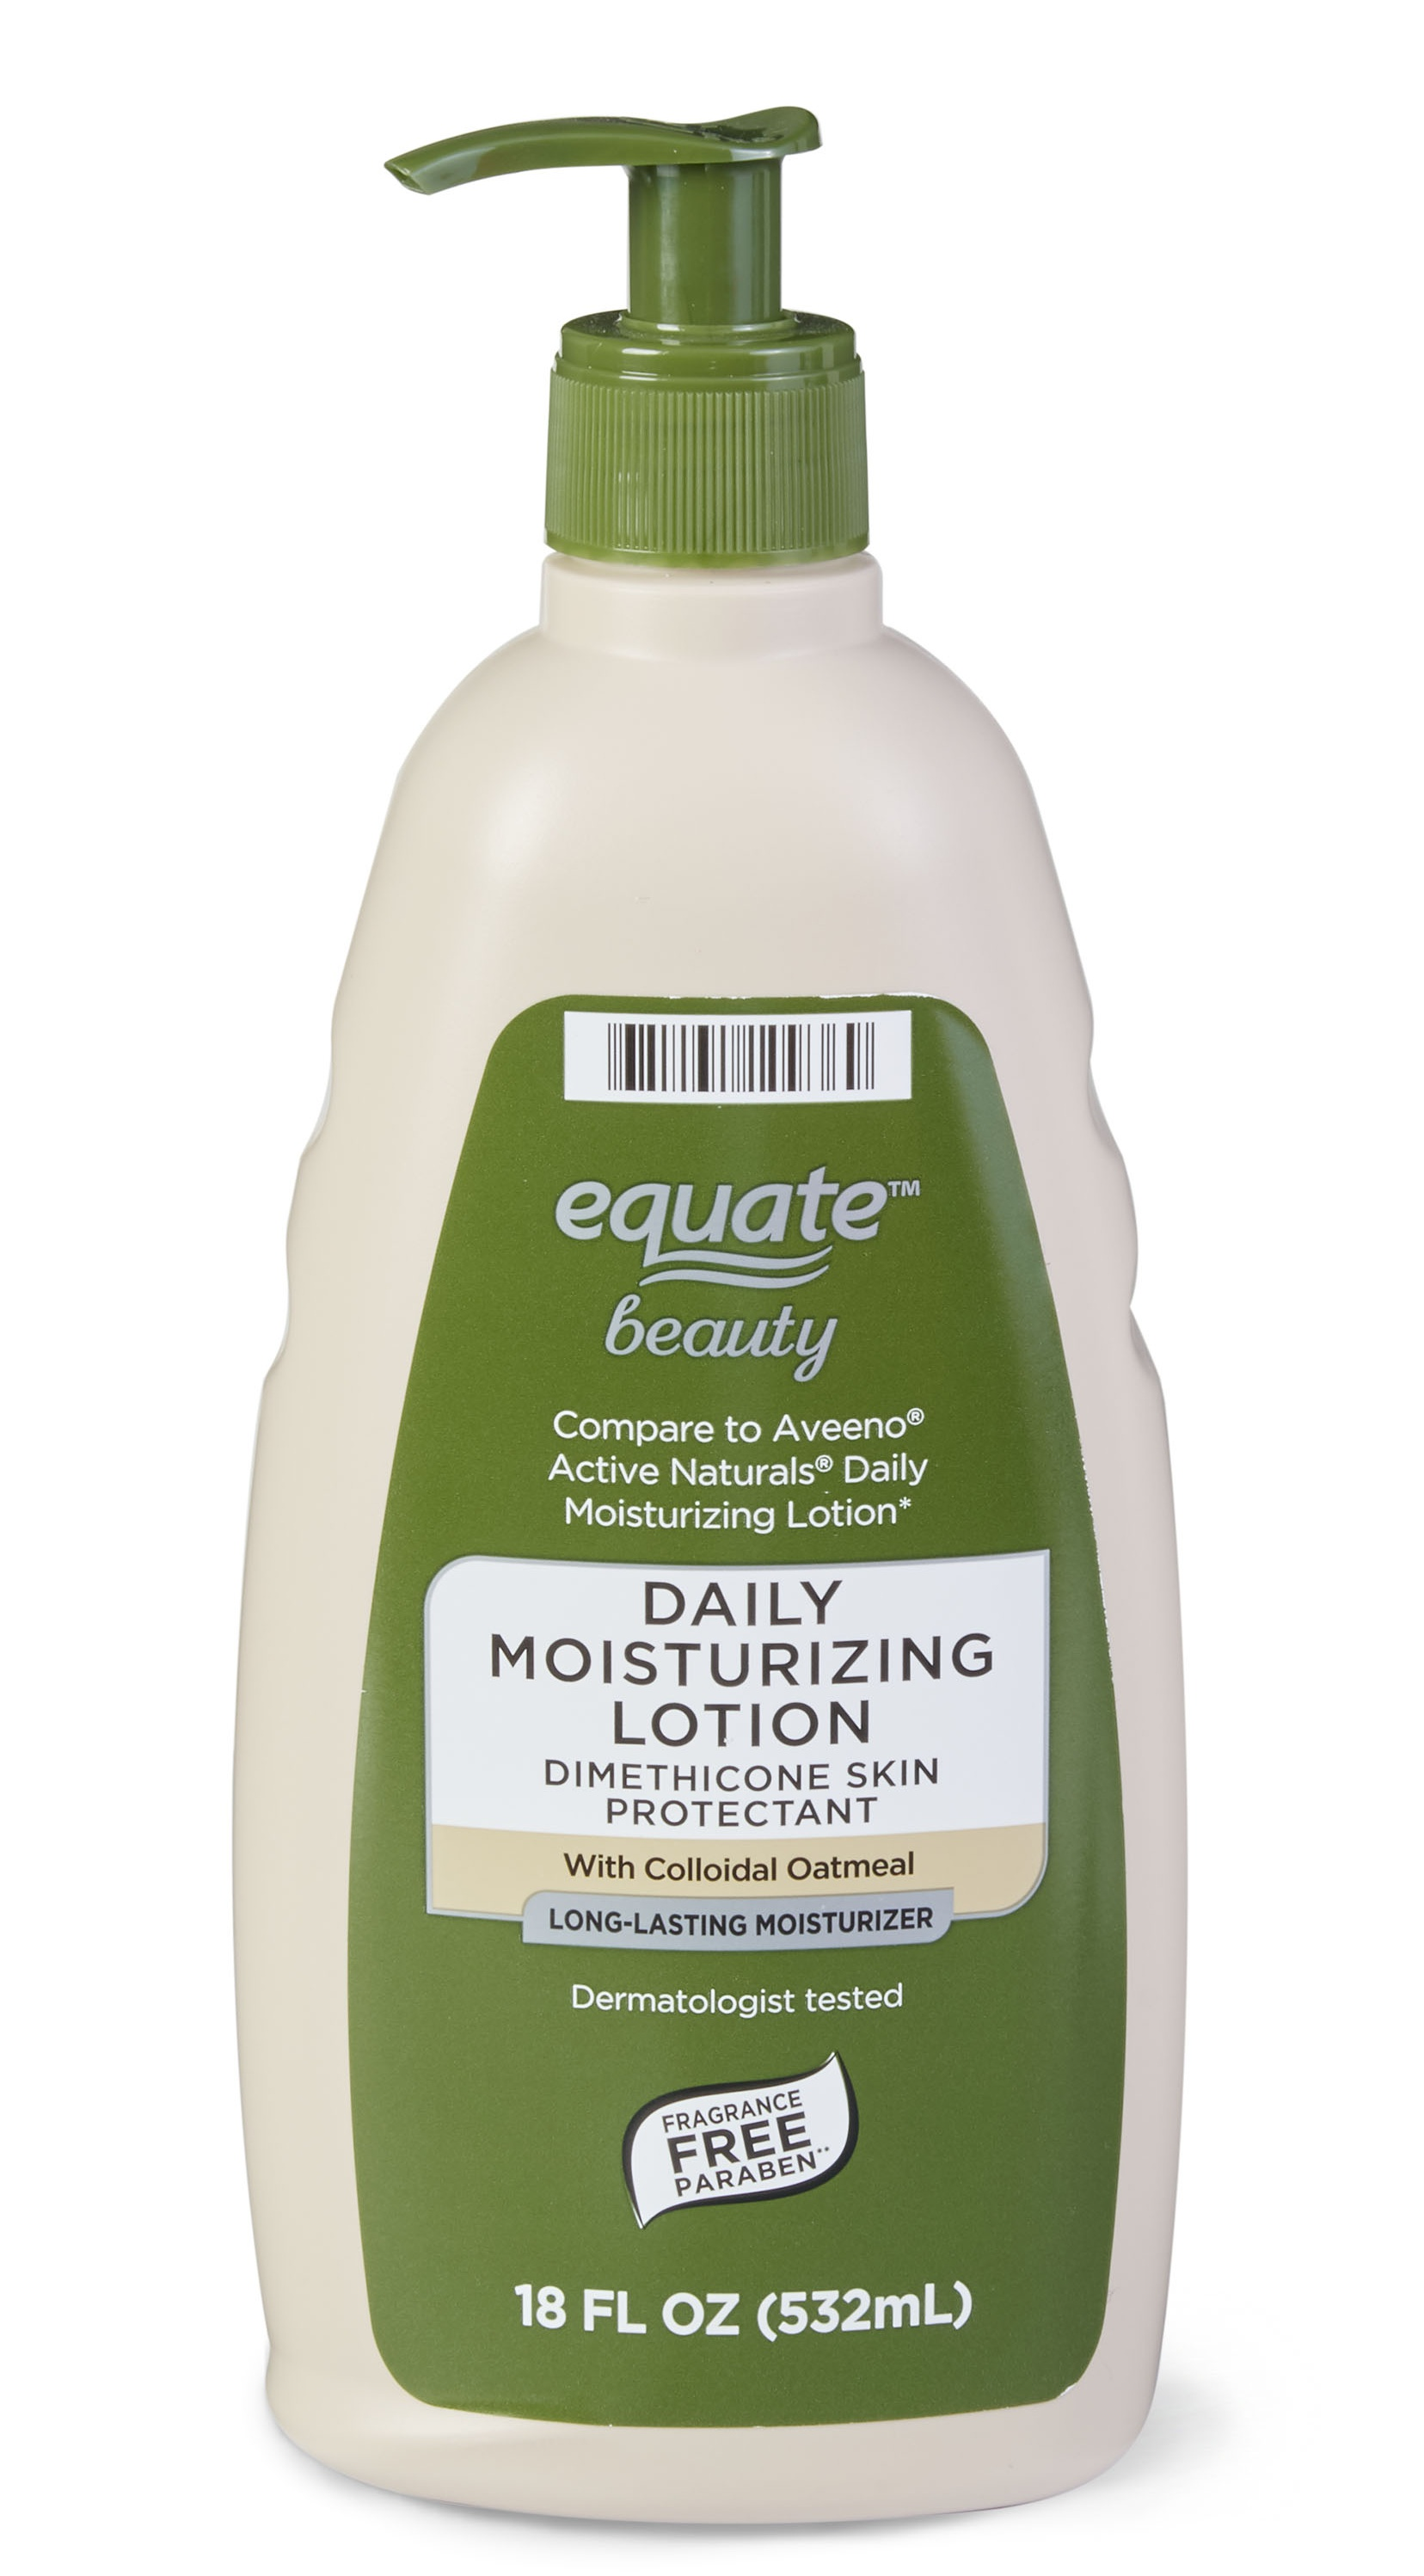 Equate Beauty Daily Moisturizing Lotion